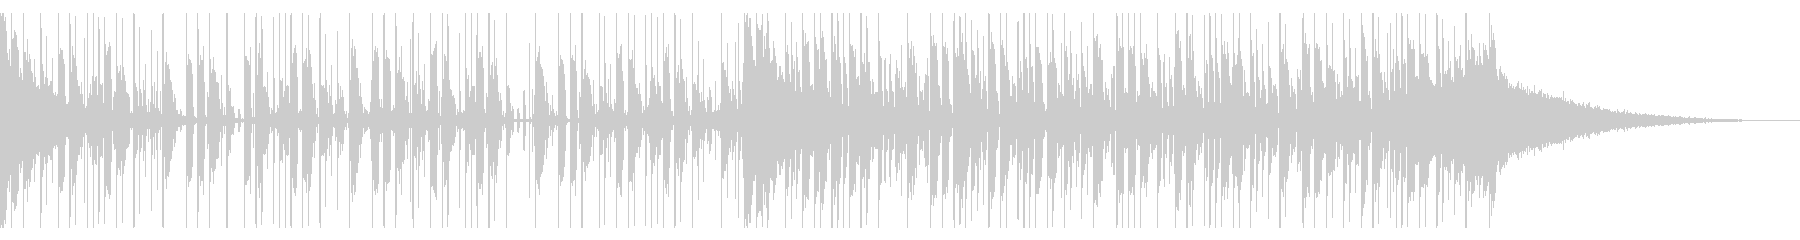 117 BPMの未再生の波形